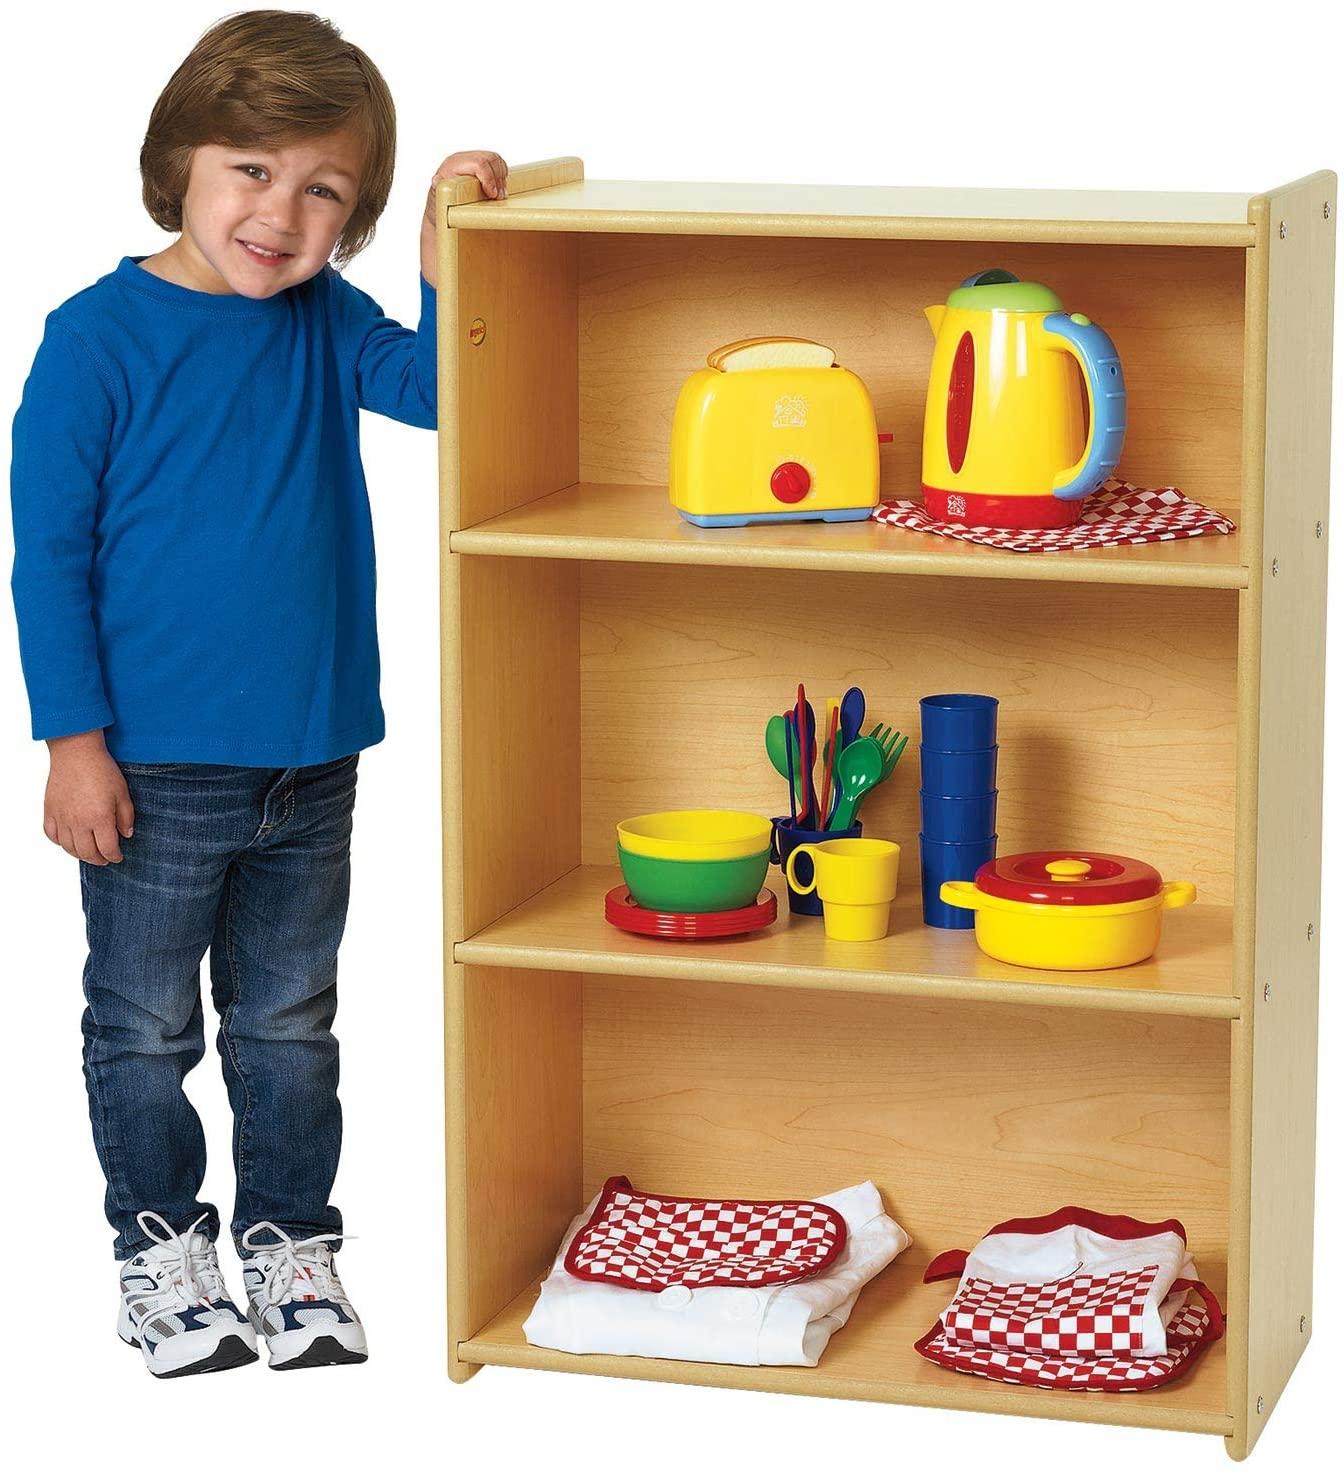 Children's Factory Angeles Value Line Narrow 3-Shelf Storage, Daycare Furniture, Kids/Toddler Bookshelf & Toy Organizer, for Homeschool/Montessori/Playroom/Preschool (ANG7083)